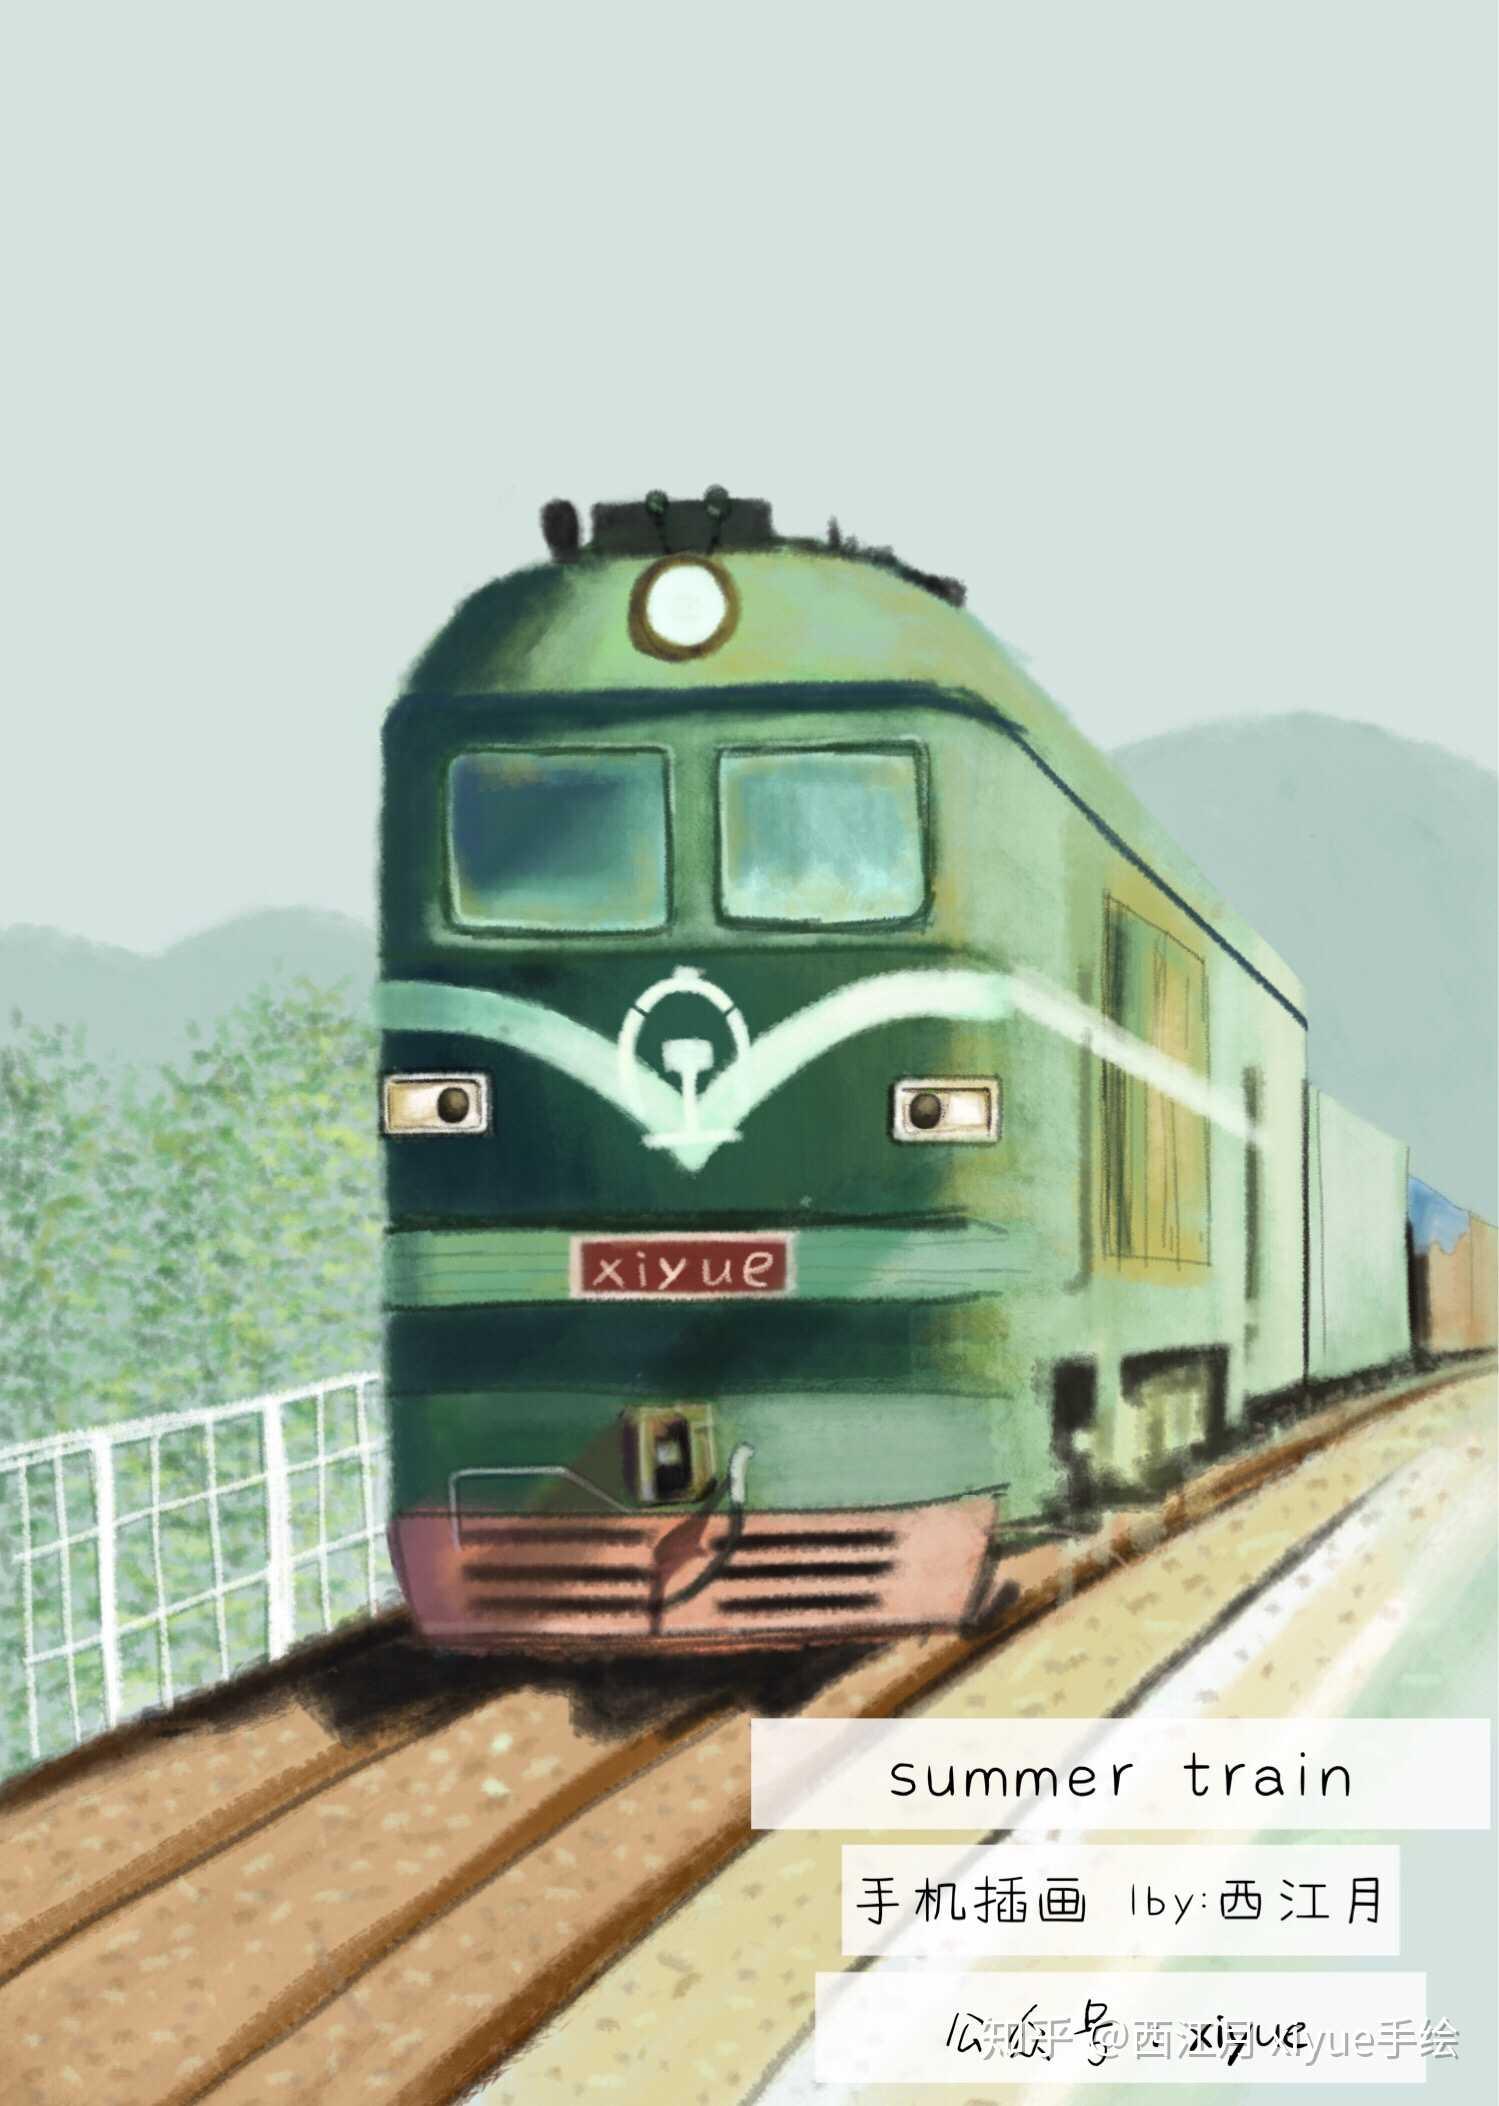 summertrain伴奏_summer train